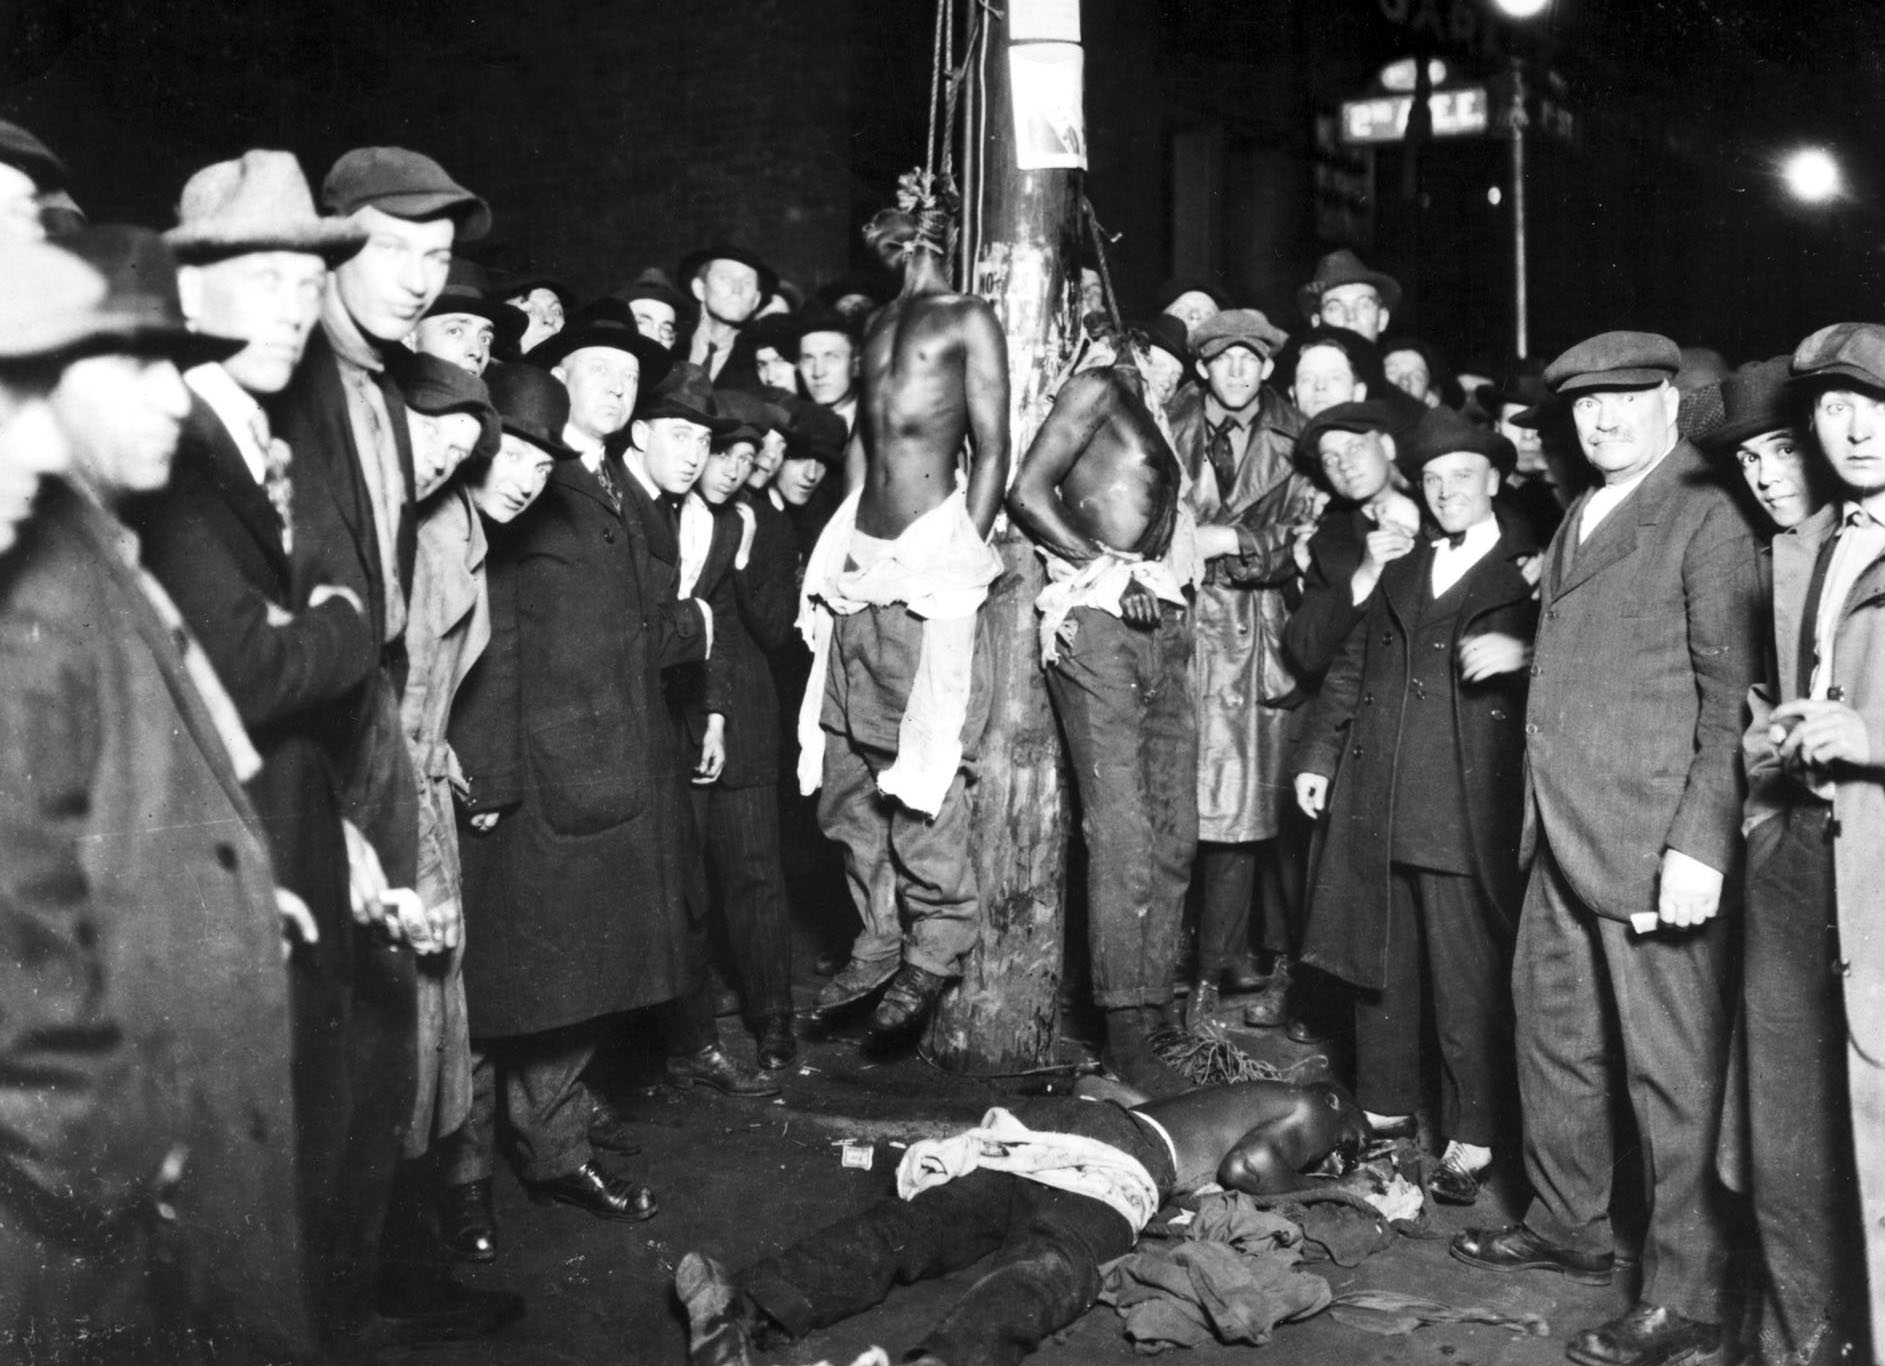 Postcard of Duluth MN lynching, 1920